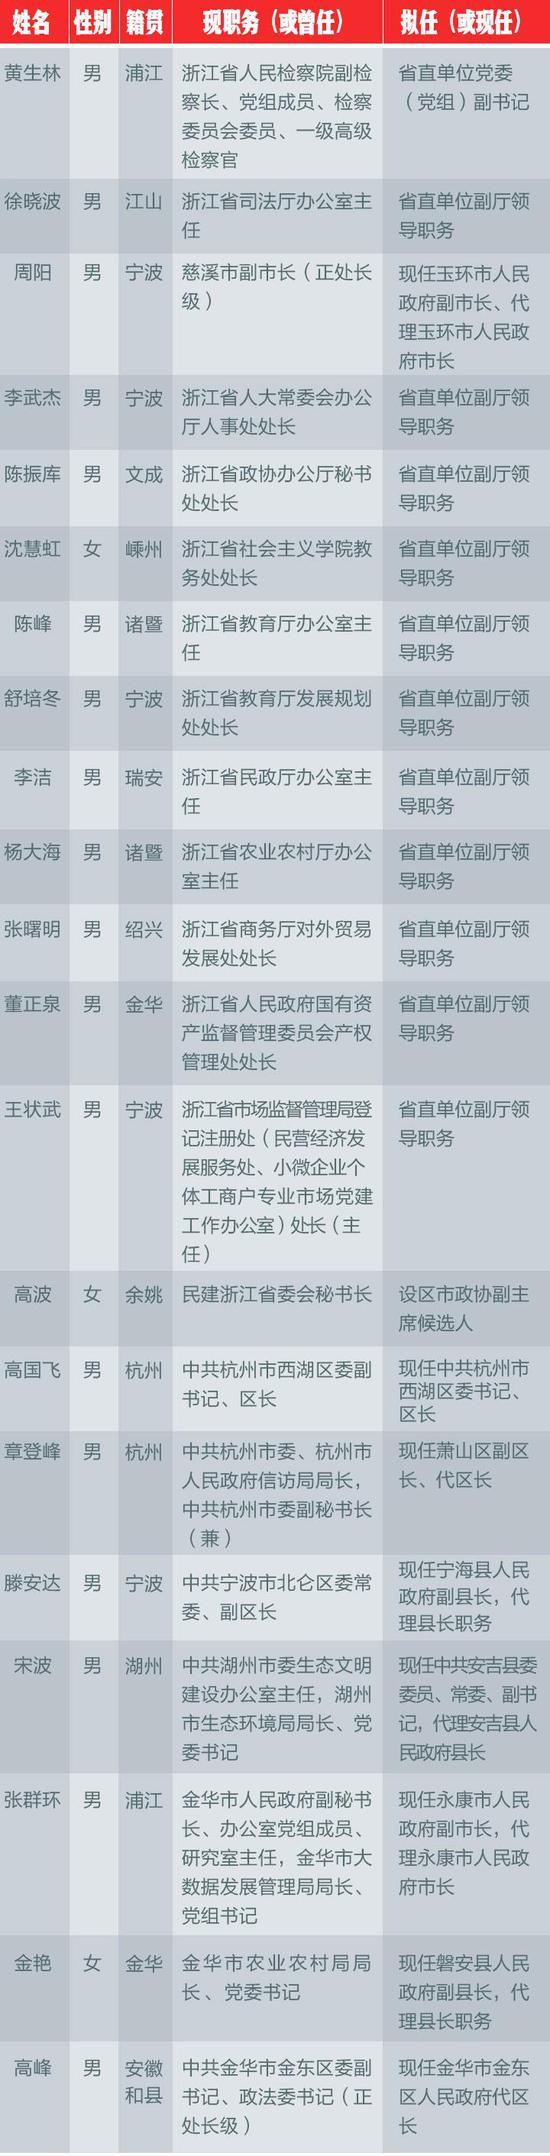 uedbet官网彩票·接待游客847.31万人次 国庆期间昆明揽金54.96亿